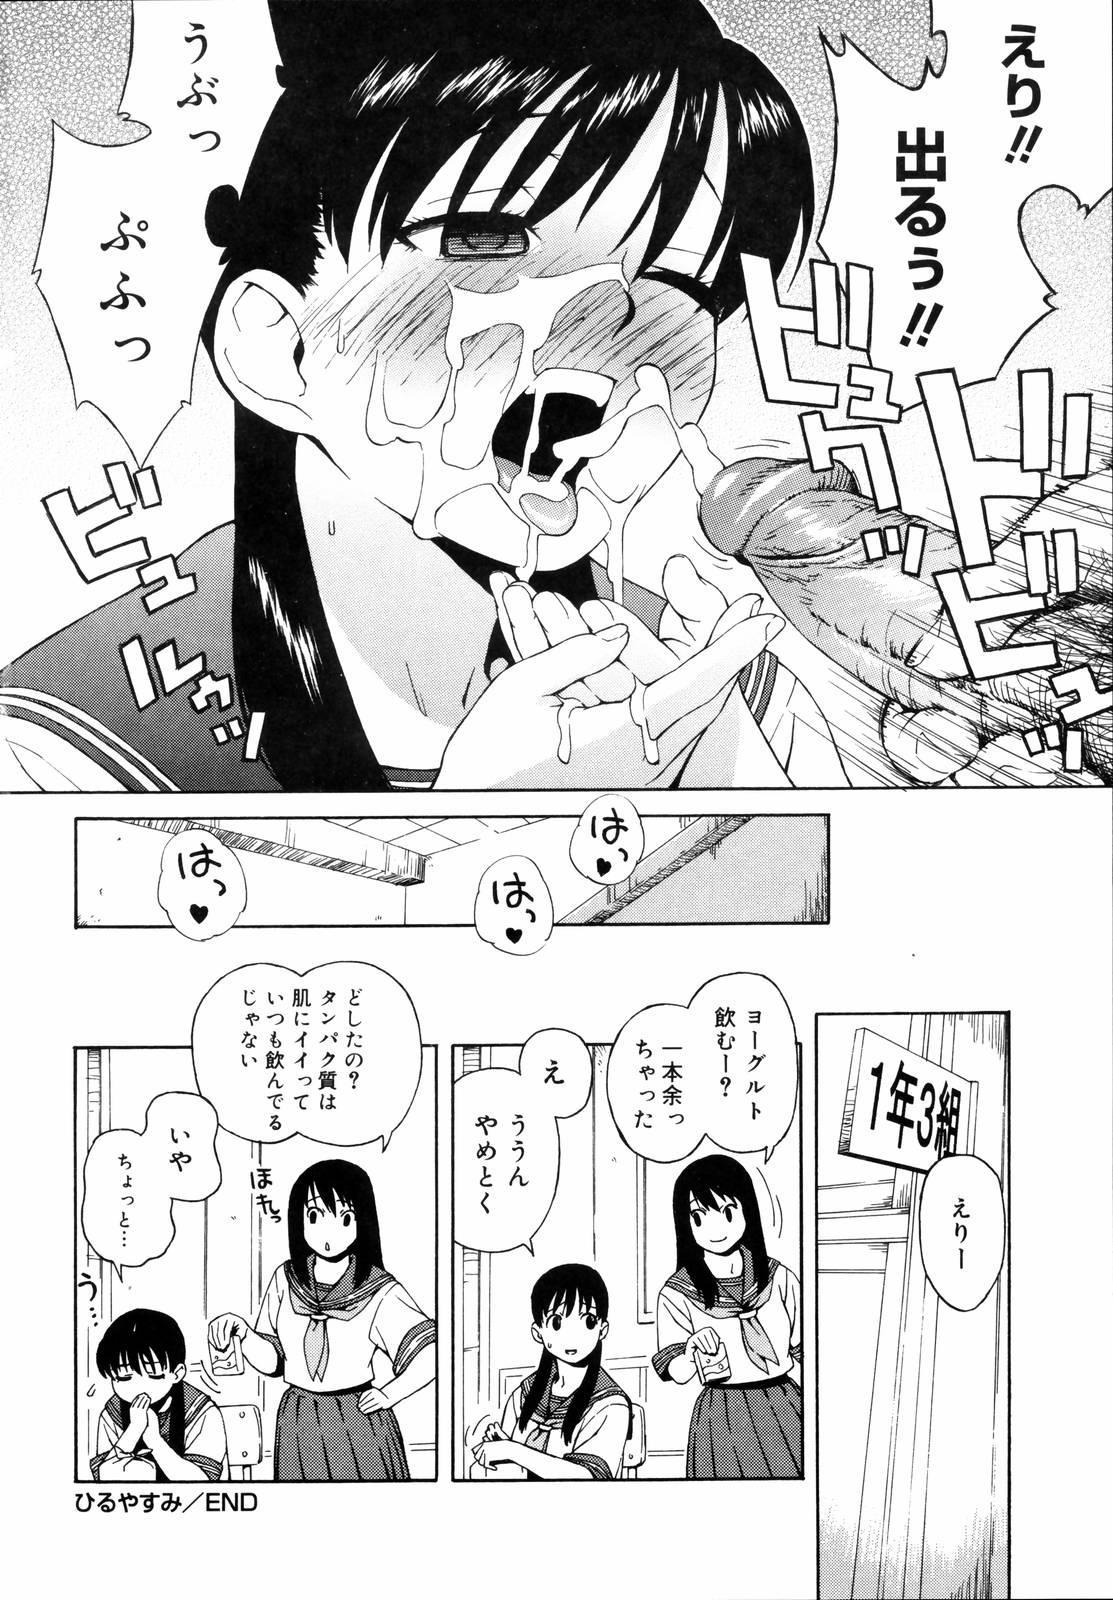 Shishunki wa Hatsujouki - Adolescence is a sexual excitement period. 87